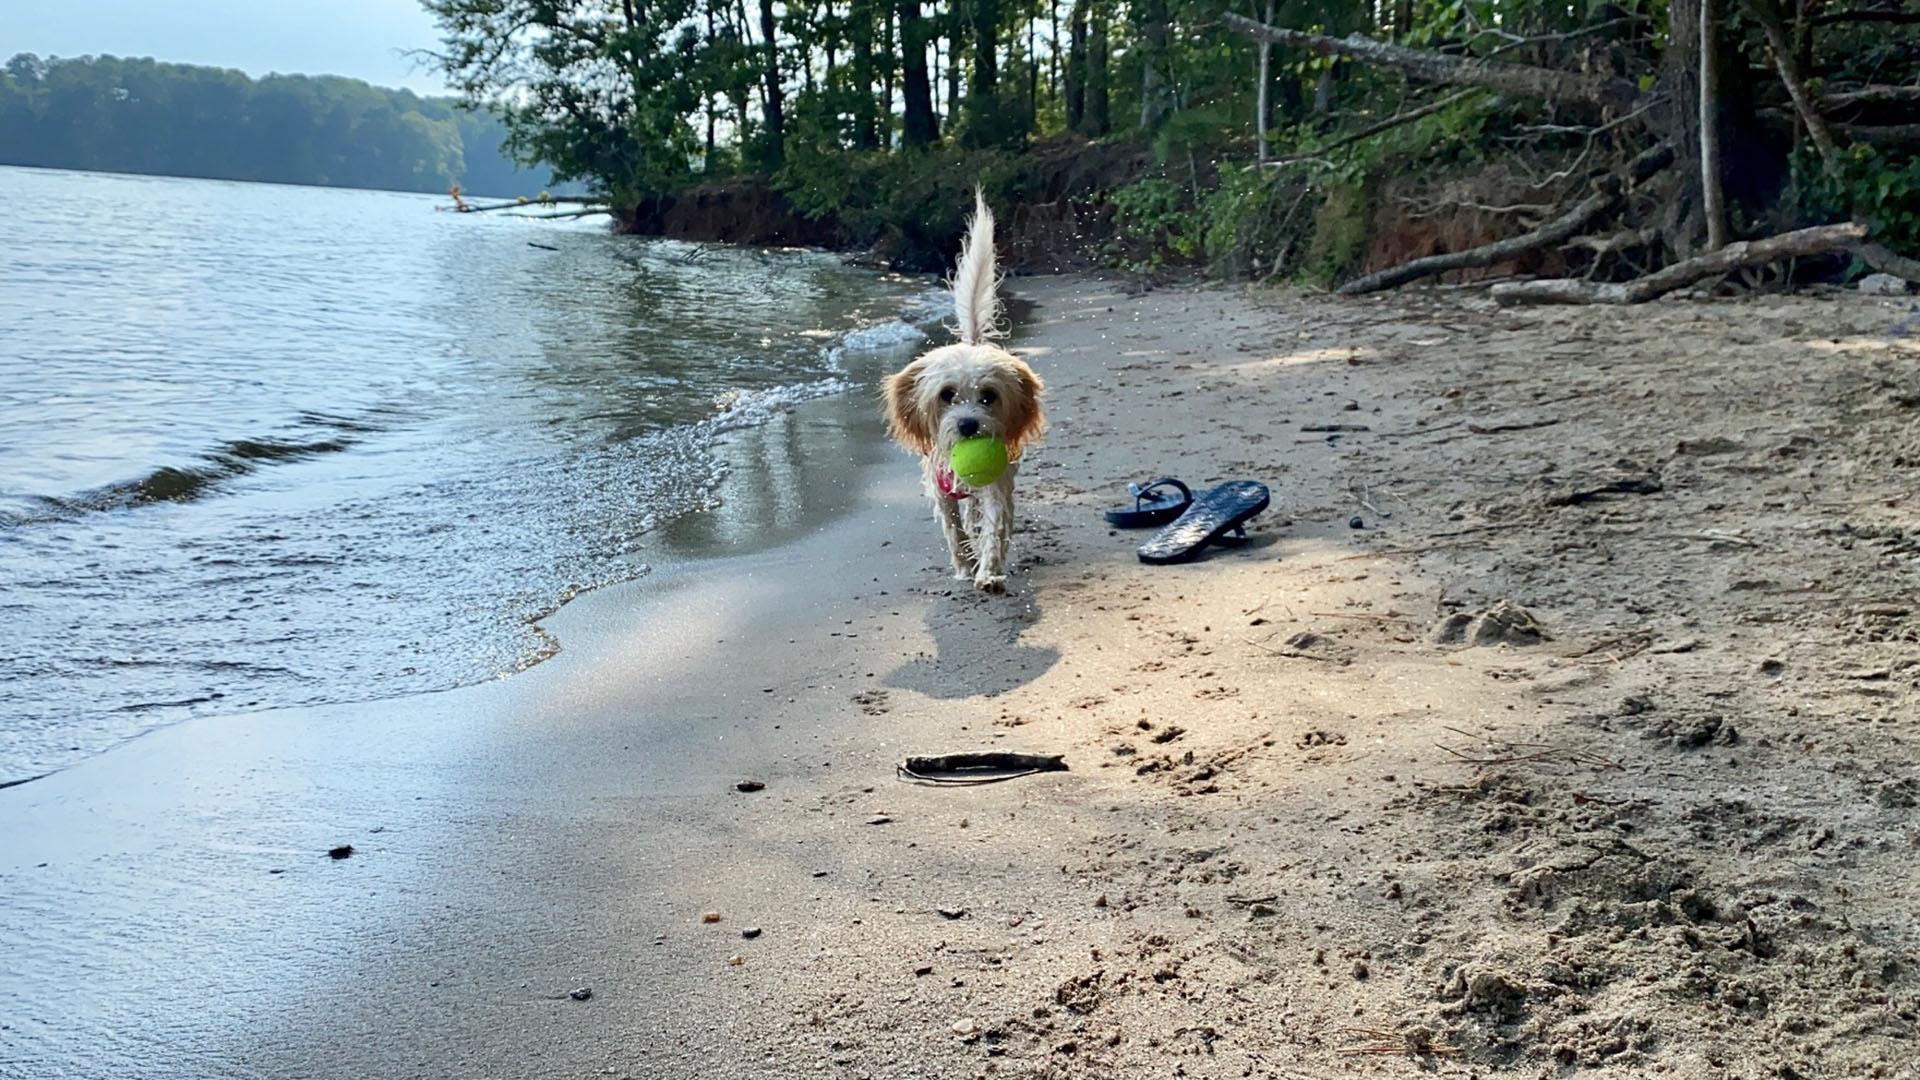 Dog playing on the beach at Lake Lanier